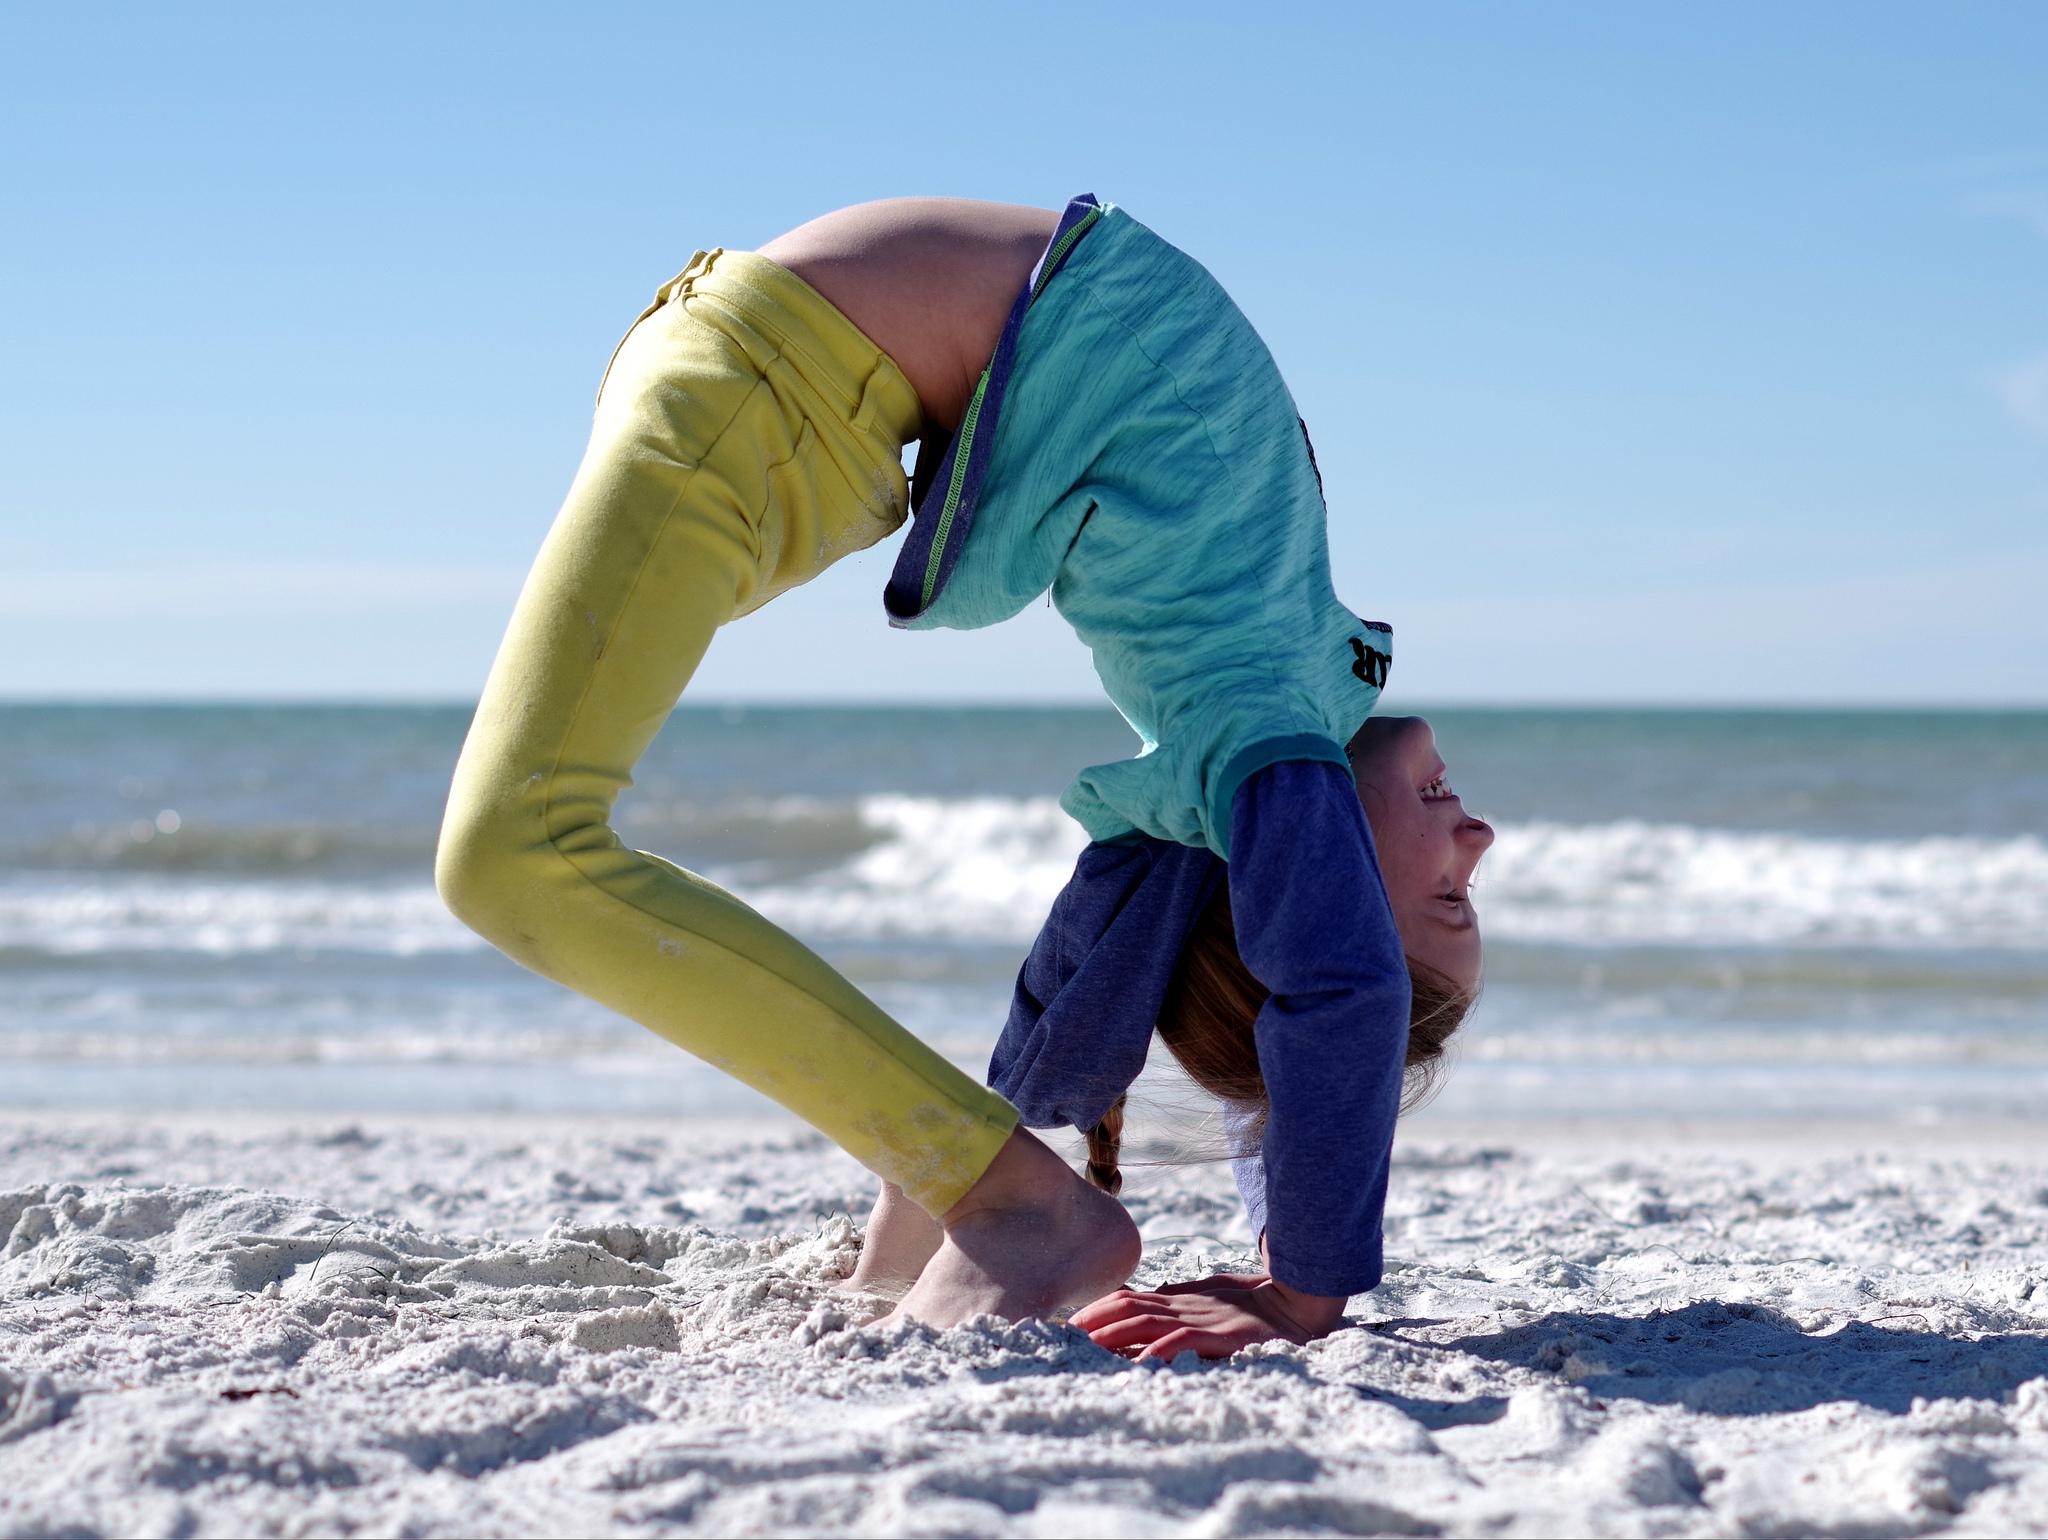 Practicing gymnastics at the beach